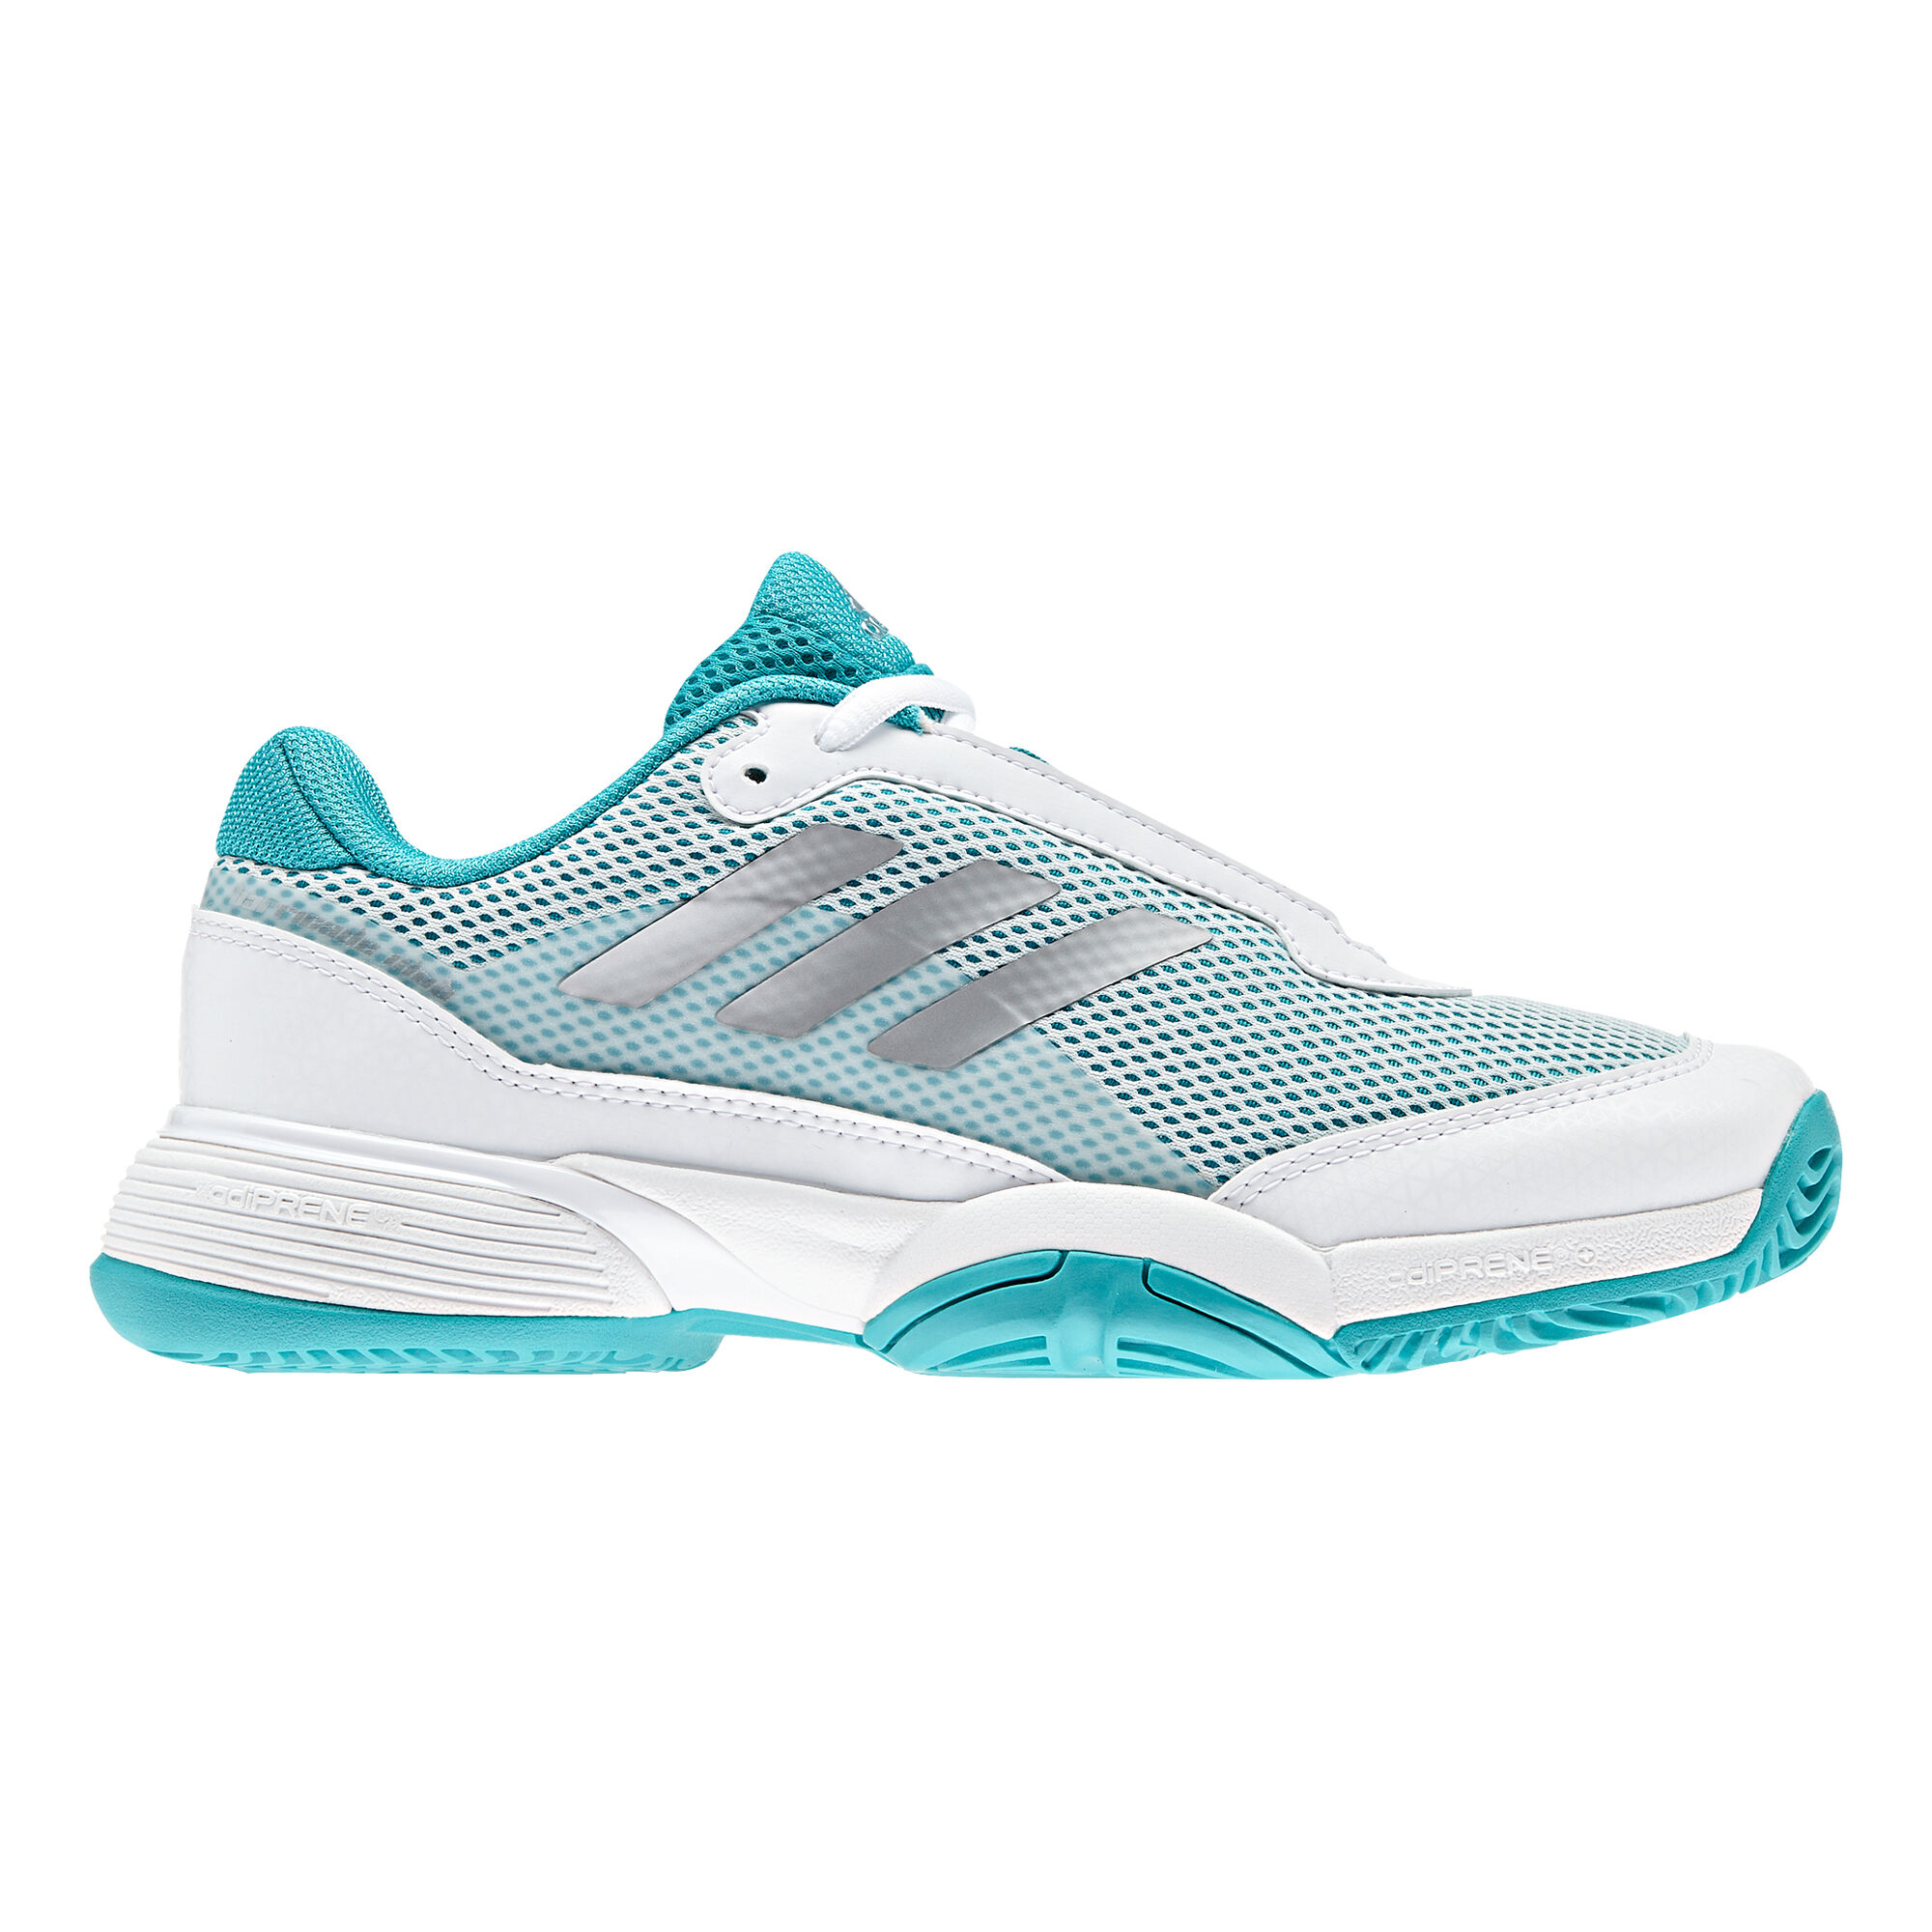 11e77b7866f adidas Barricade Club Allcourt-sko Børn - Hvid, Turkis køb online ...